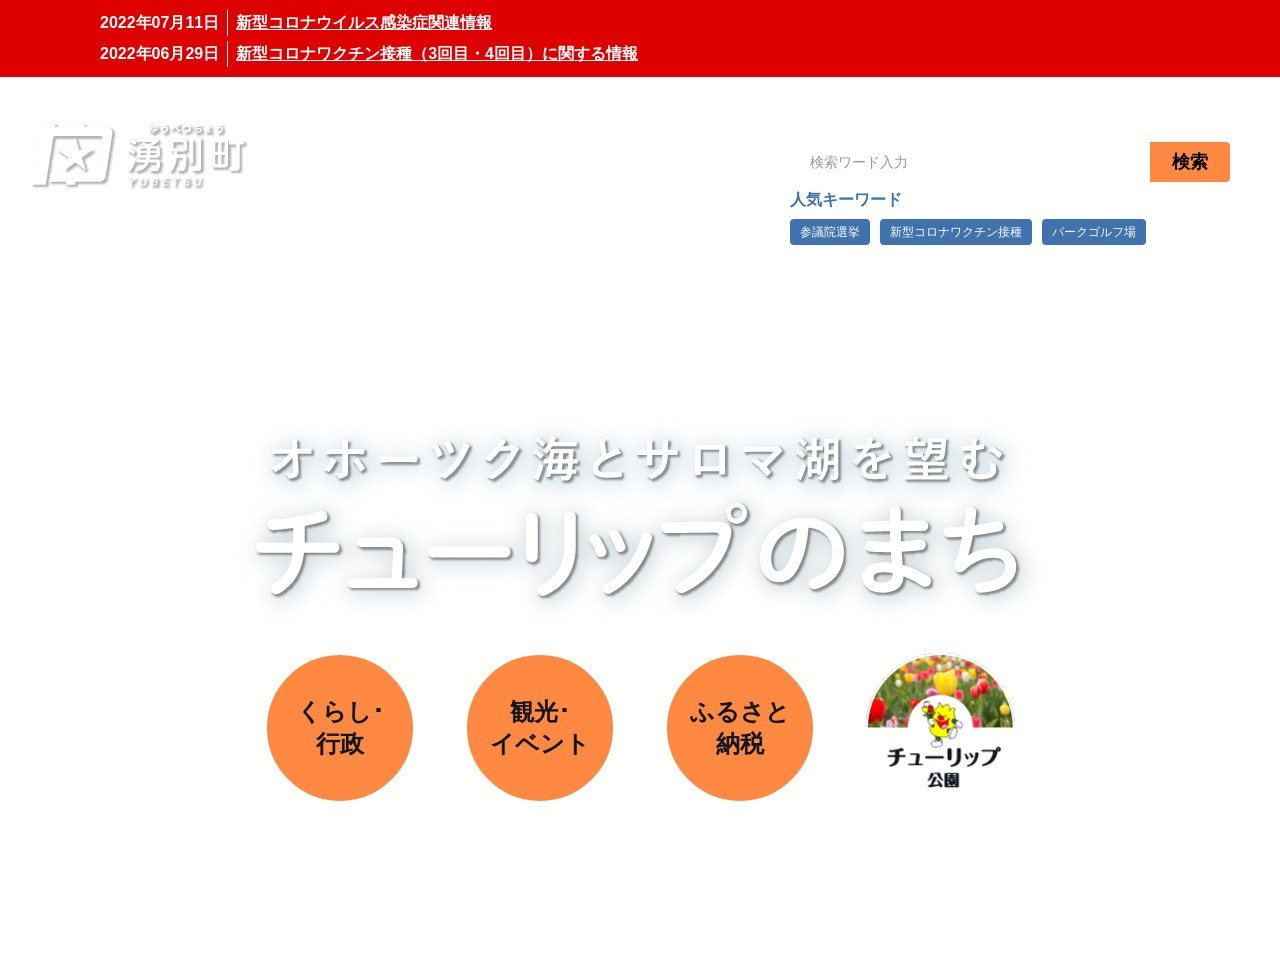 http://www.town.yubetsu.lg.jp/st/kikaku/mega2.html